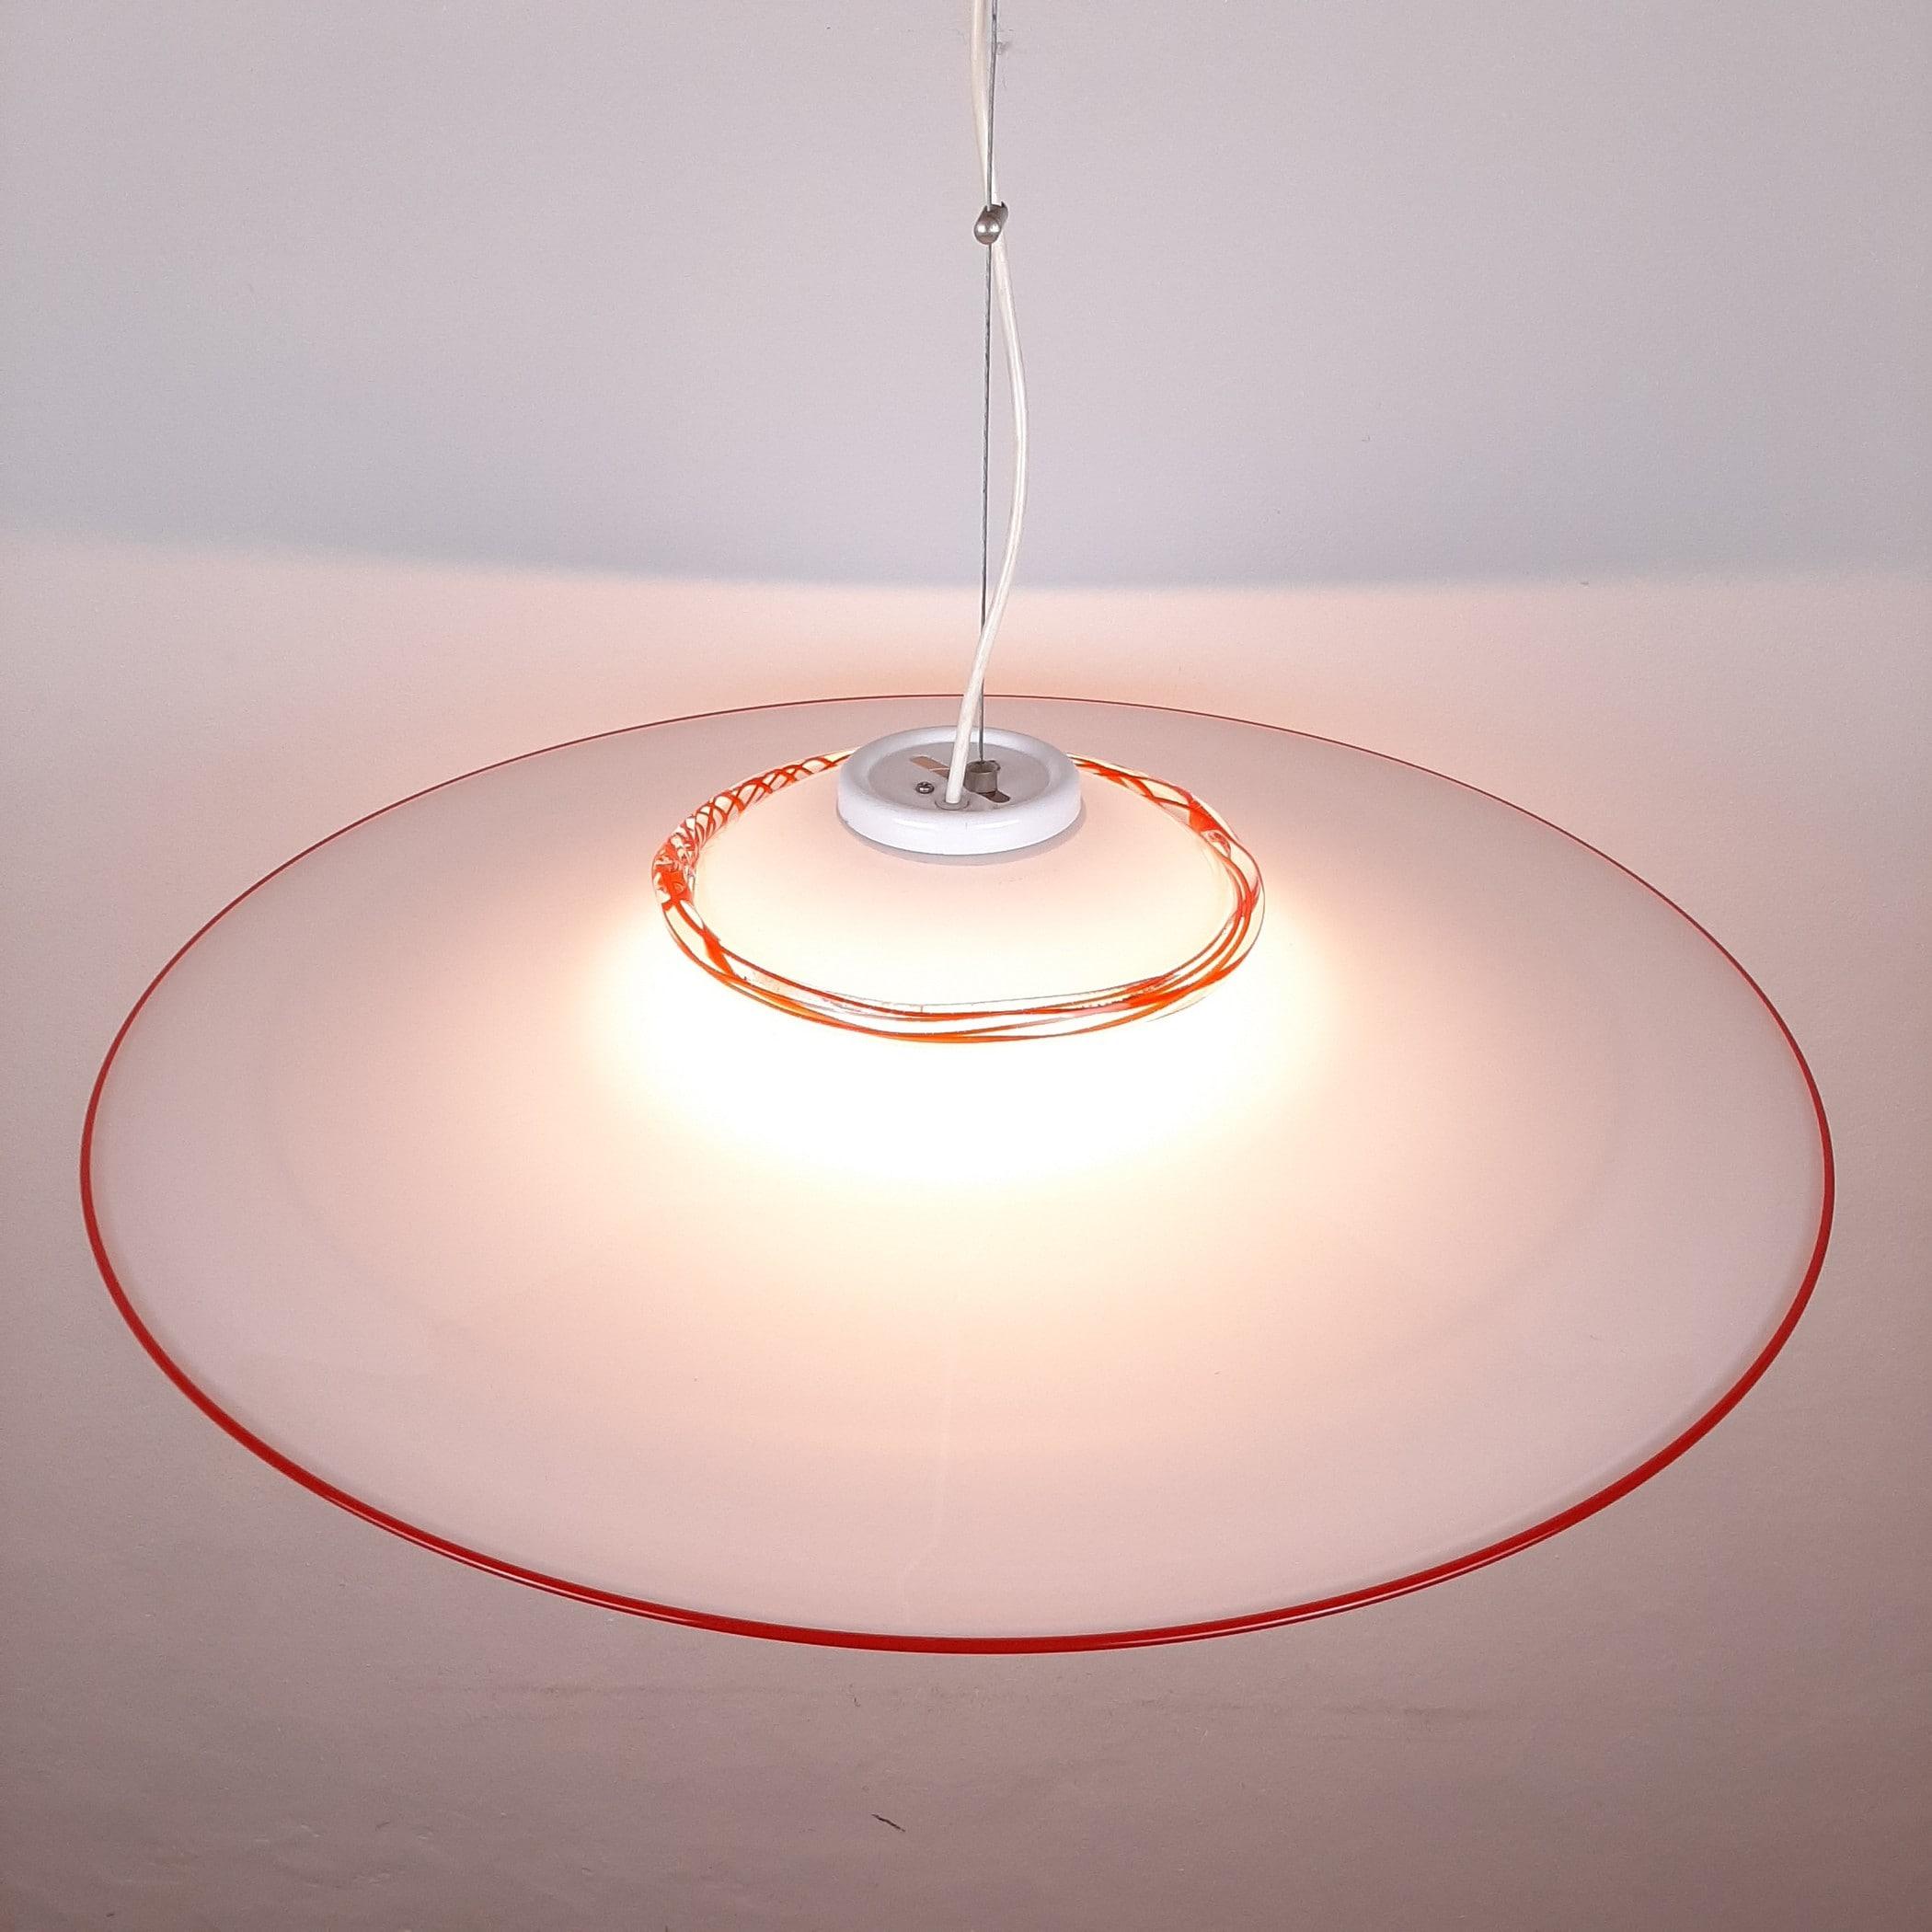 XXL Murano glass pendant lamp Italy 1970s Retro chandelier Mid-century light Space age